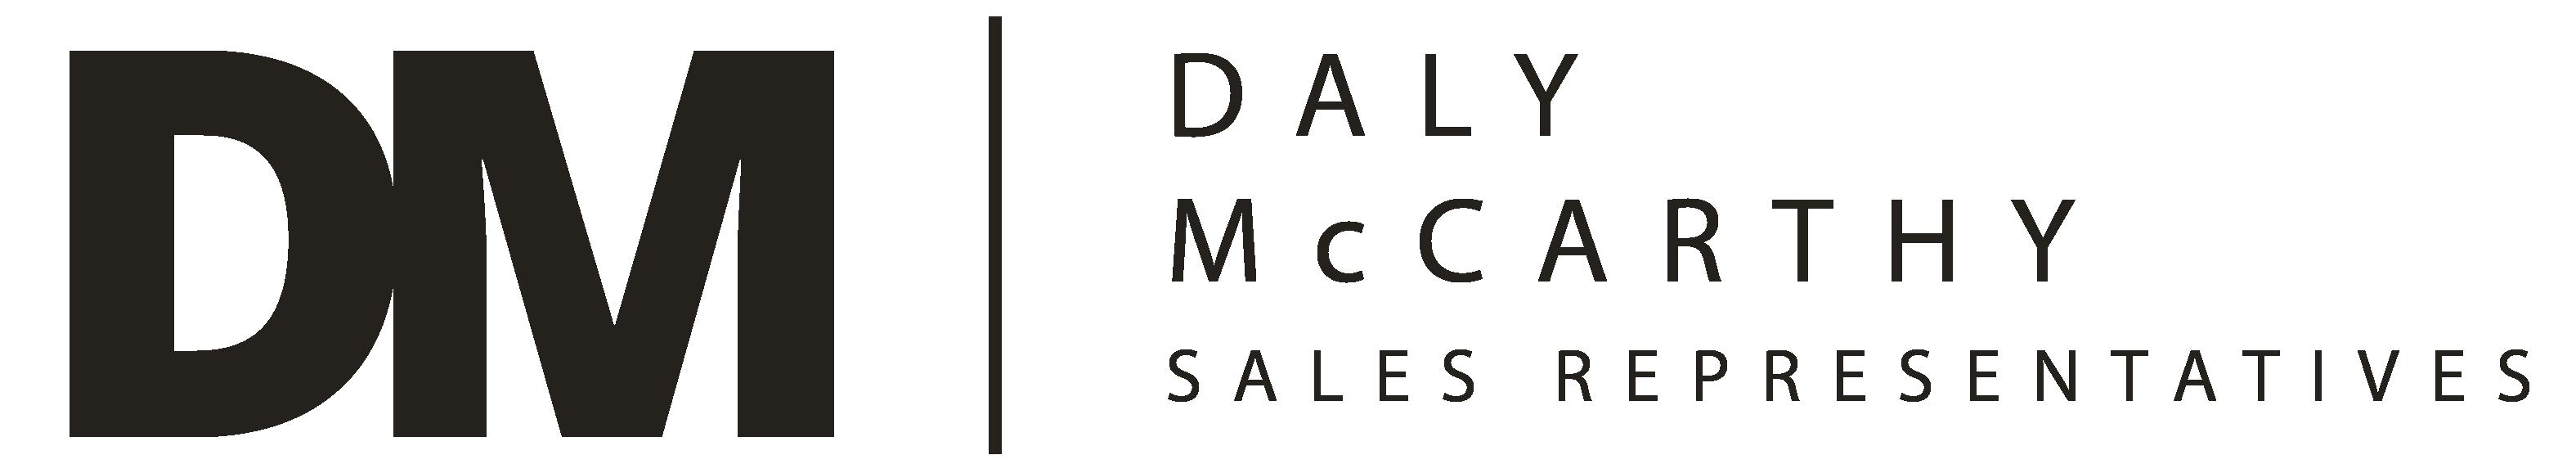 logoDalyMcCarthy-01